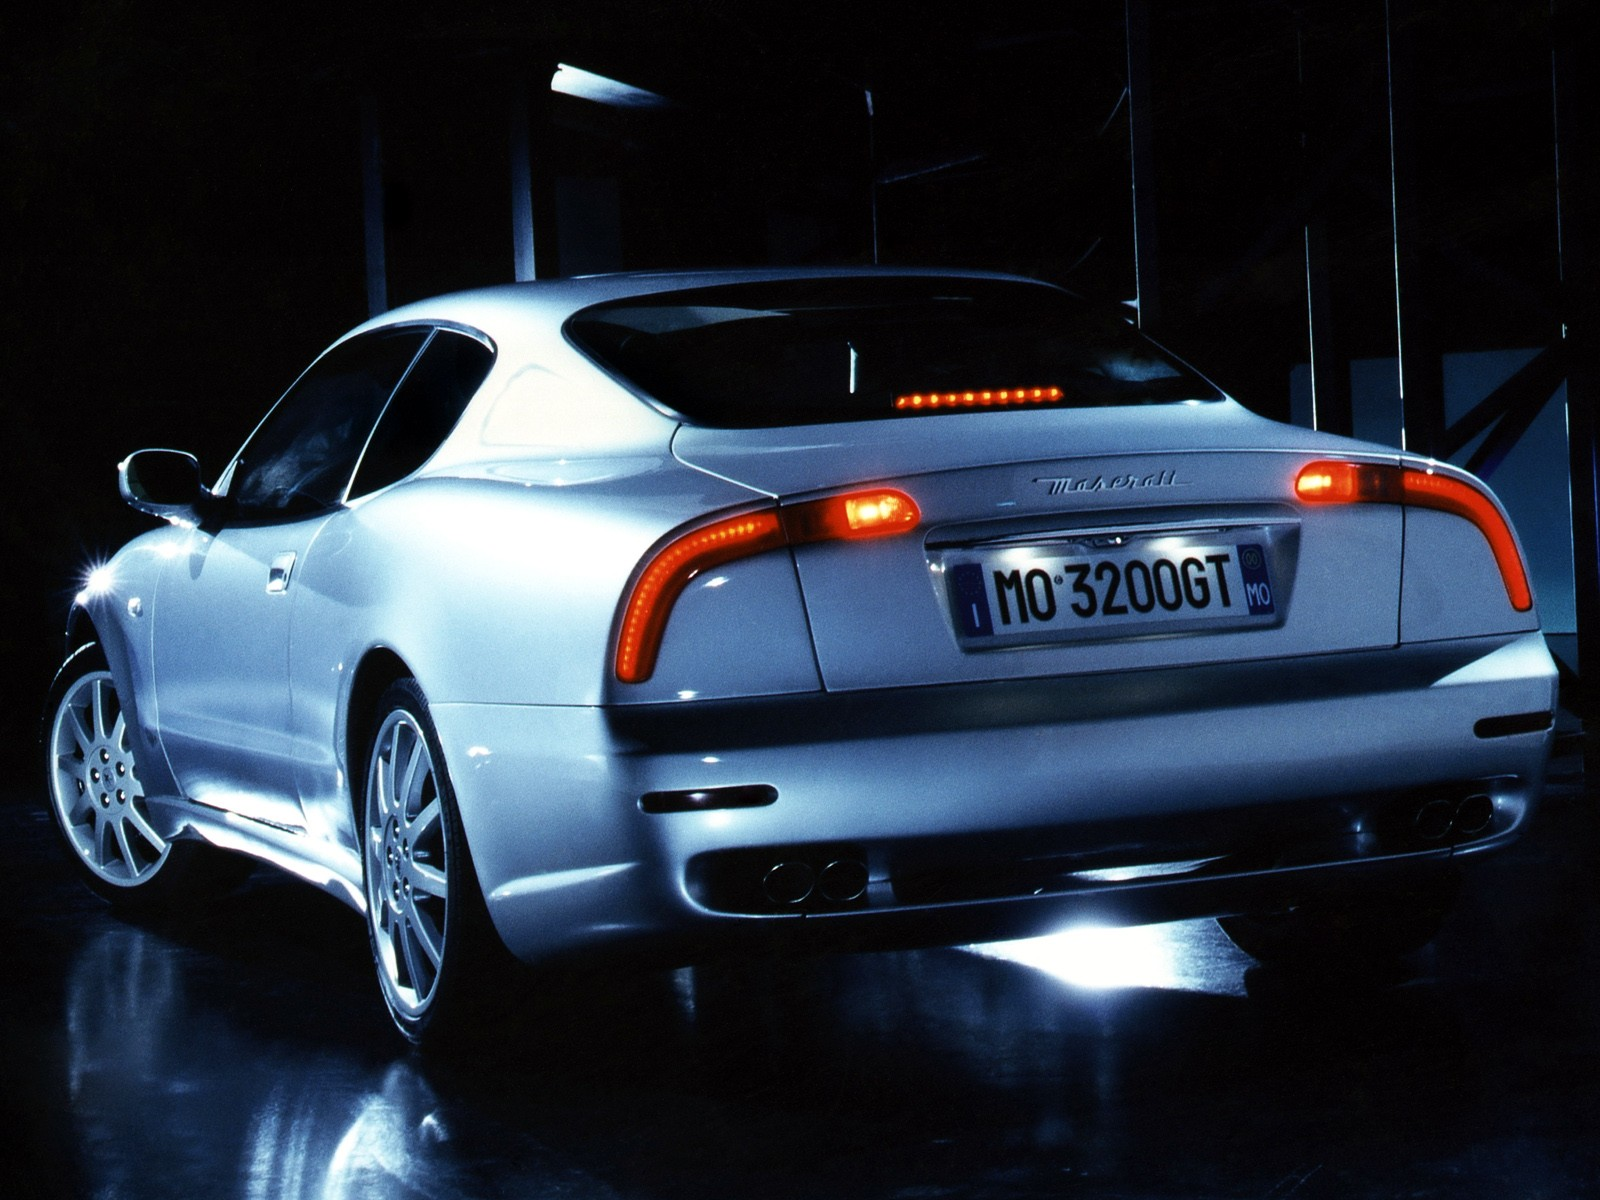 Diesel Wallpaper Cars Maserati 3200 Gt Specs 1998 1999 2000 2001 2002